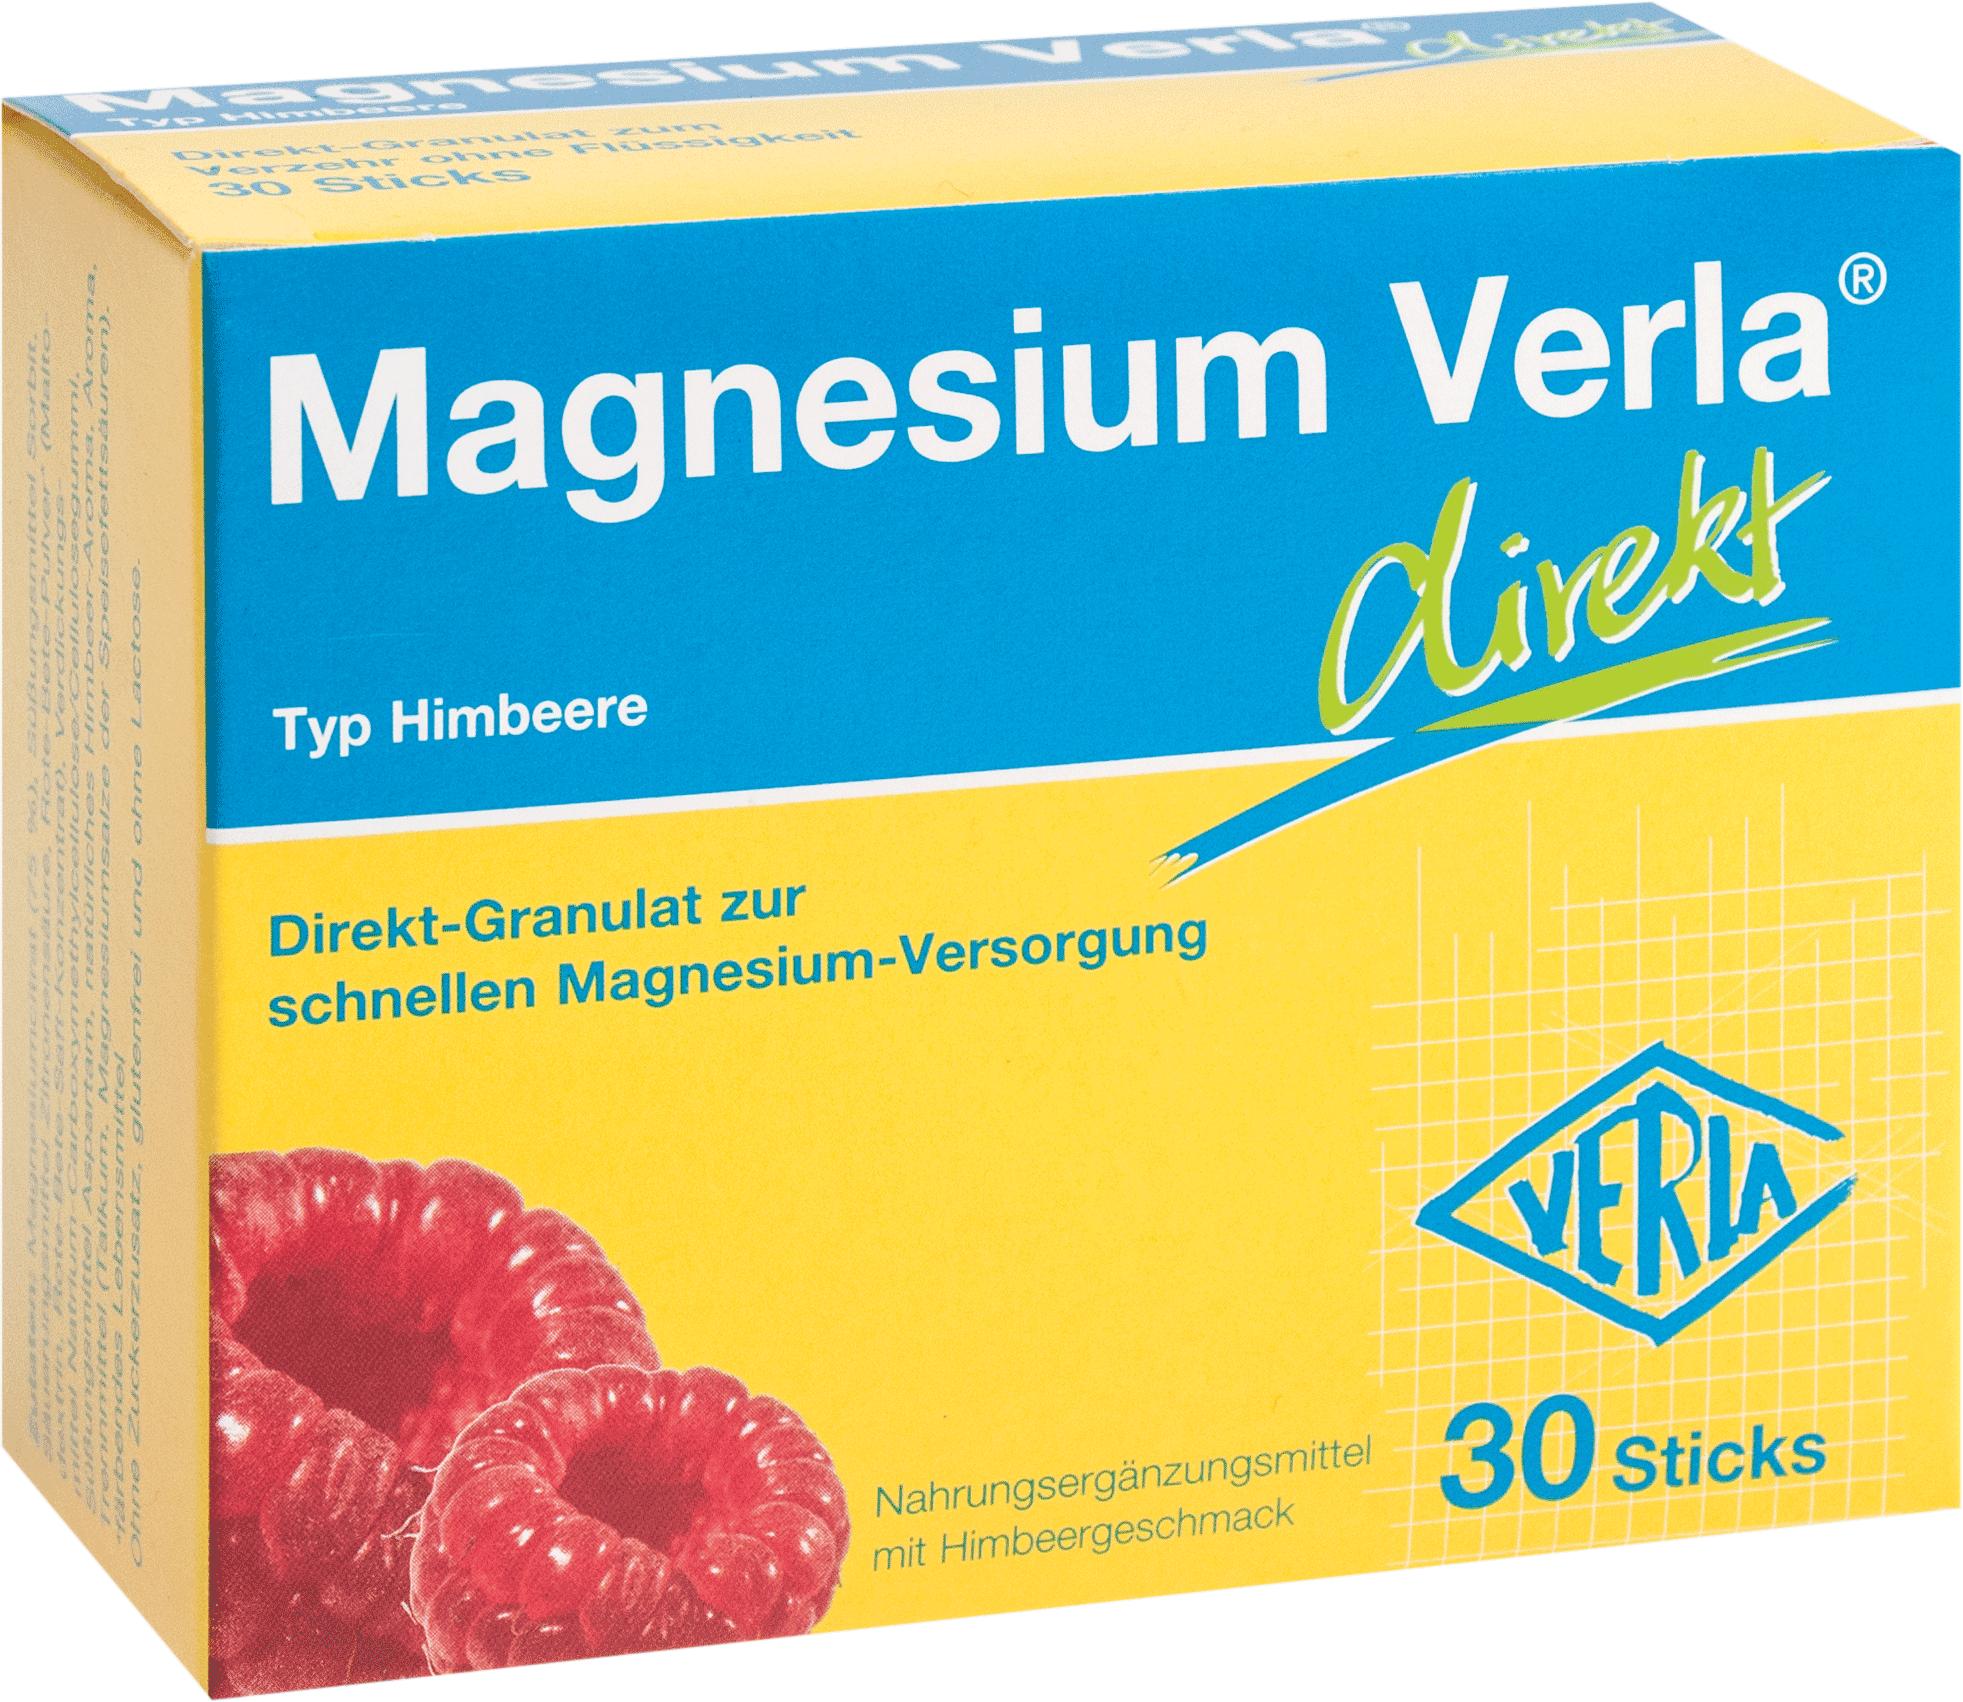 Magnesium Verla direkt Himbeere